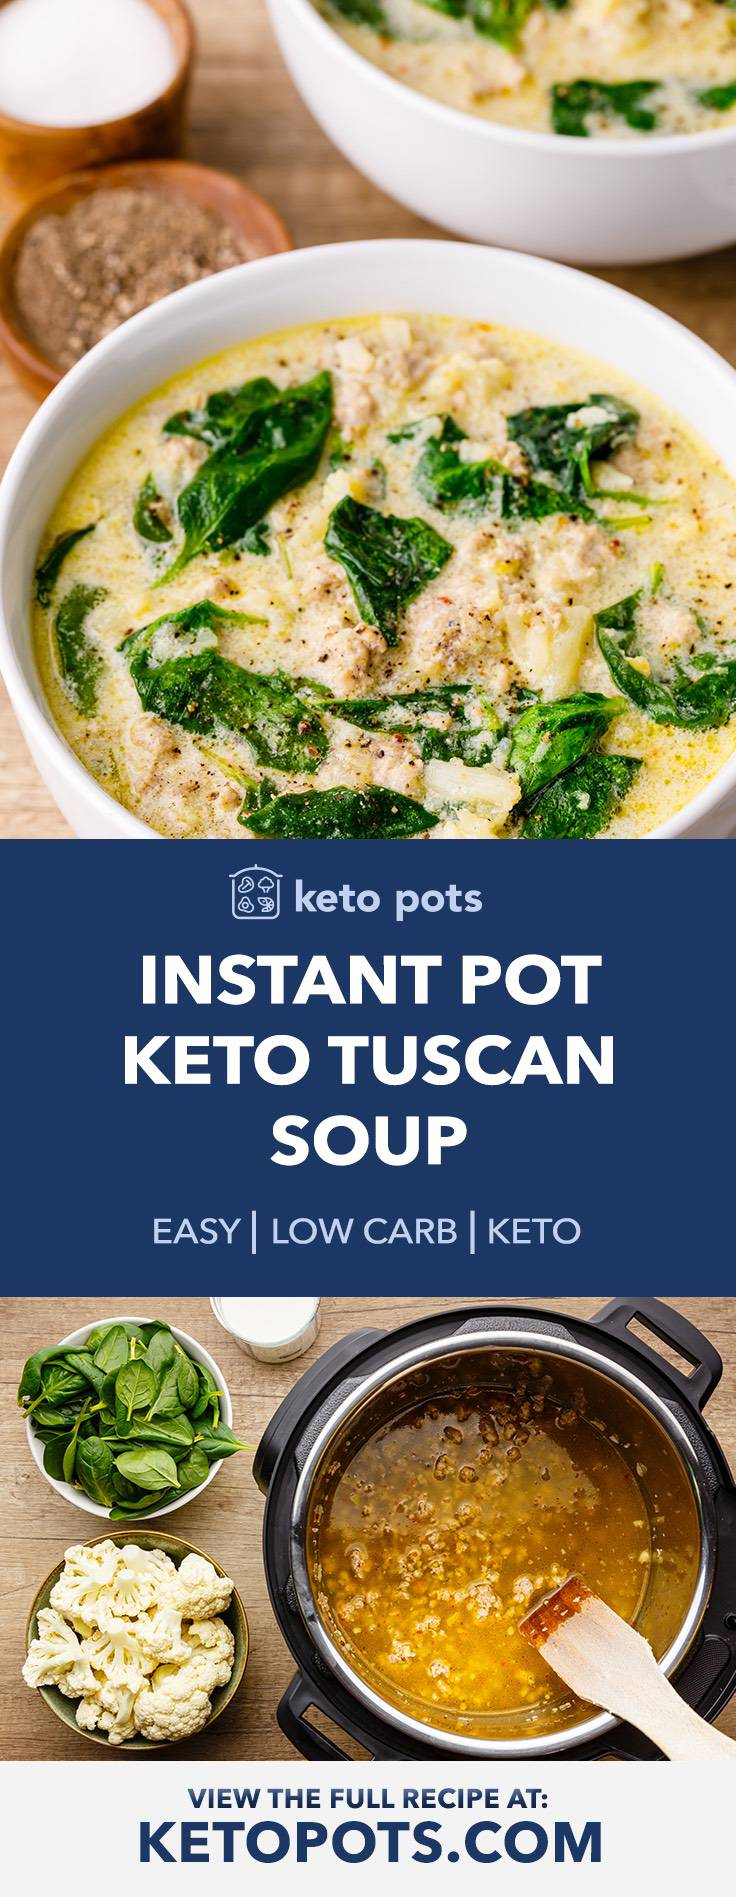 OMG-worthy Instant Pot Keto Tuscan Soup (Zuppa Toscana Recipe)